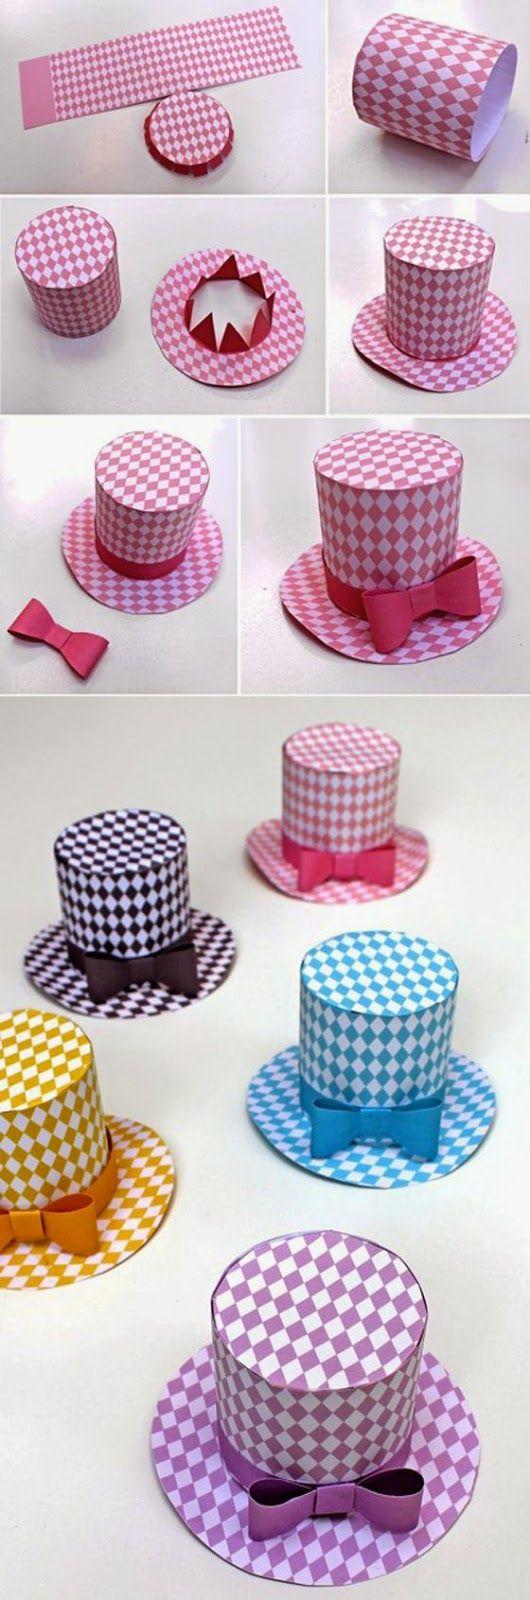 M s de 25 ideas incre bles sobre como hacer sombreros for Como hacer un criadero de carpas